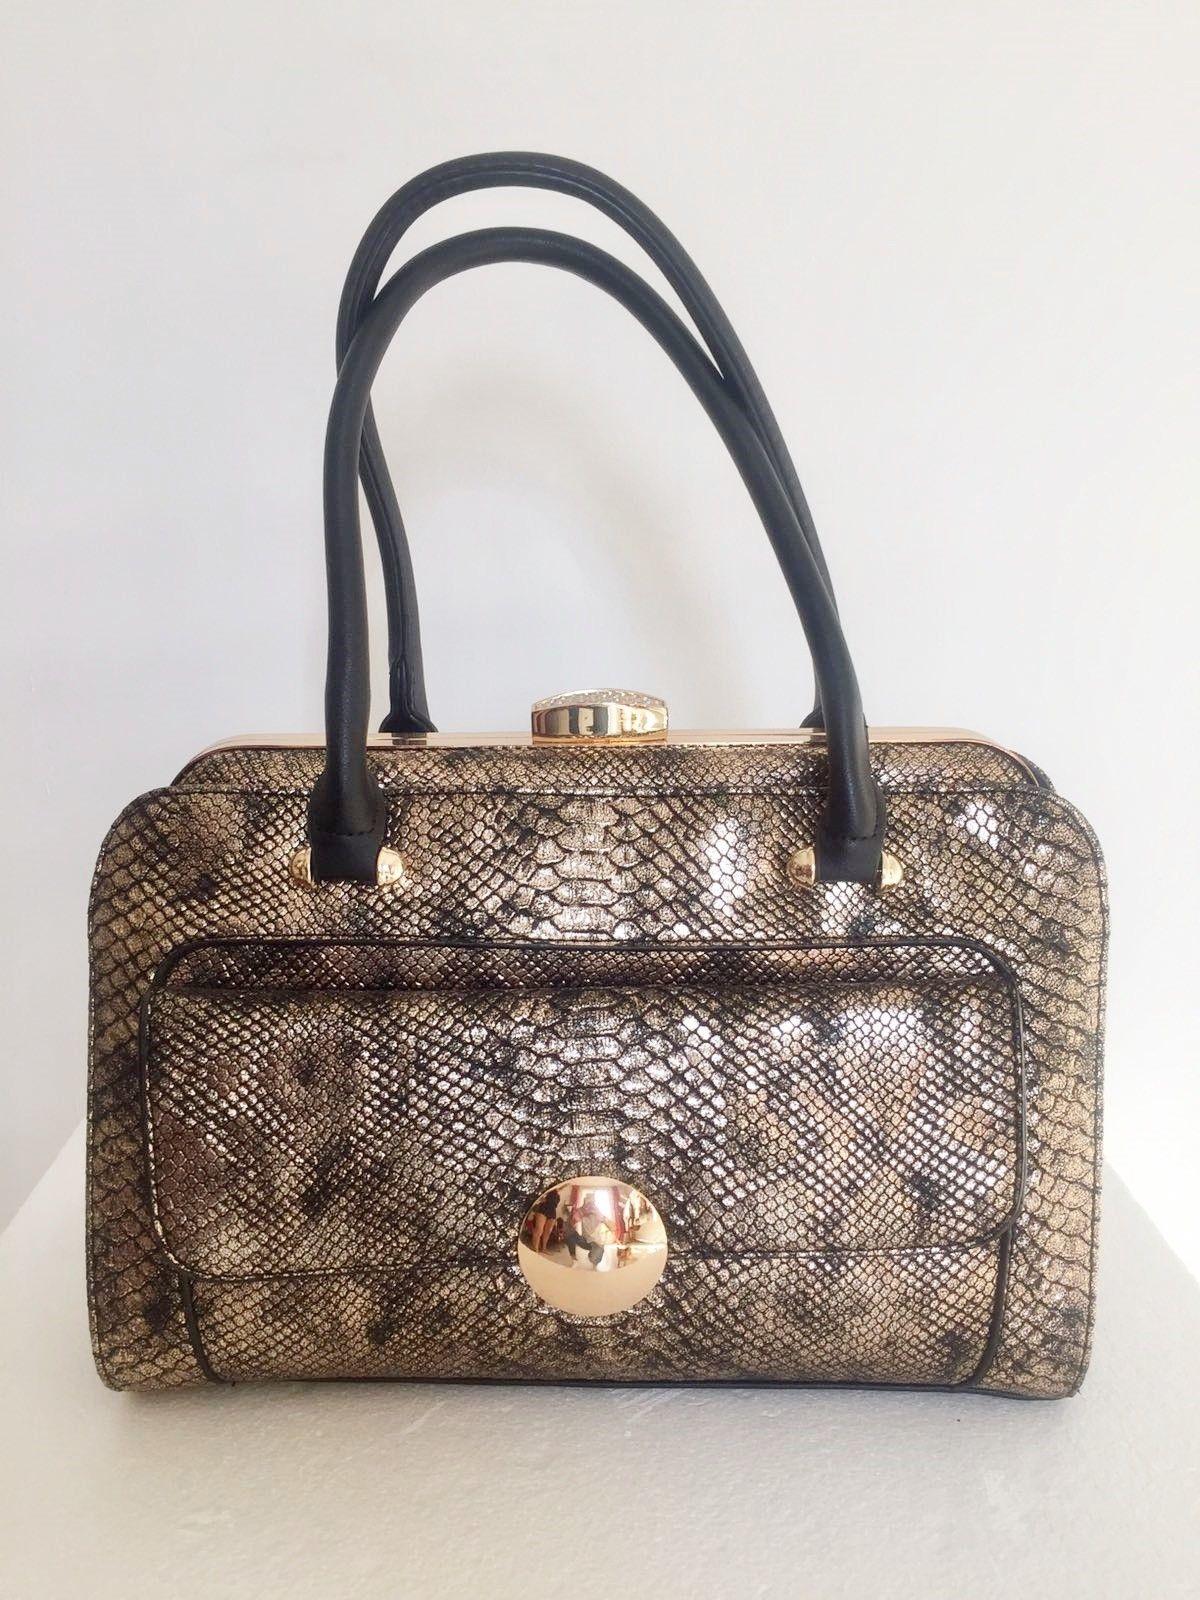 Borsa LadyBug Stampa Pitone Cod.1014